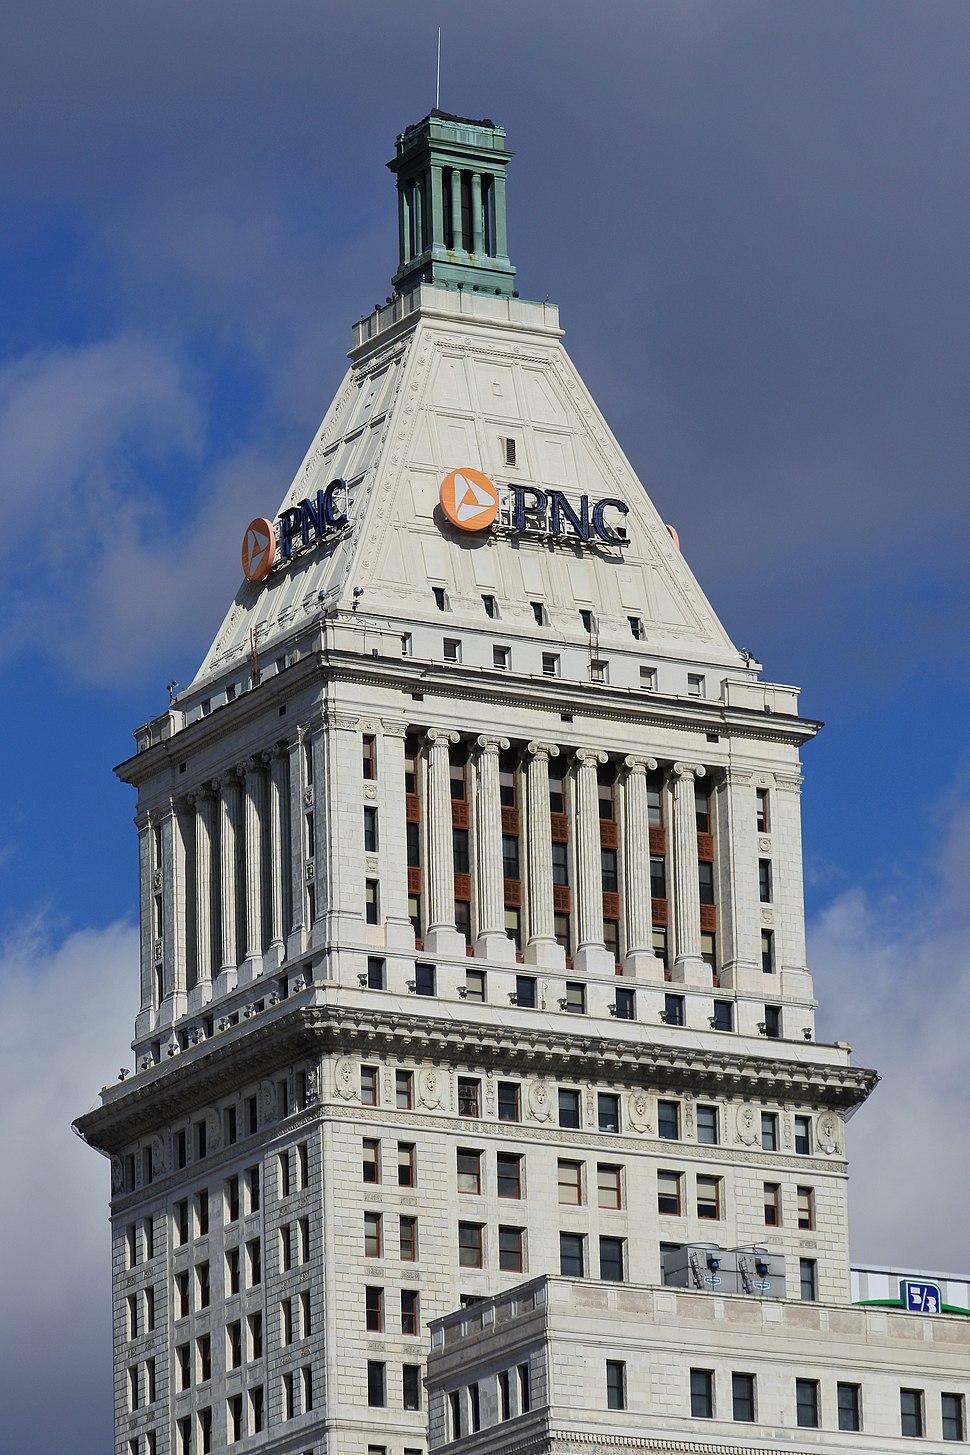 PNC Tower Cincinnati - Close-up view